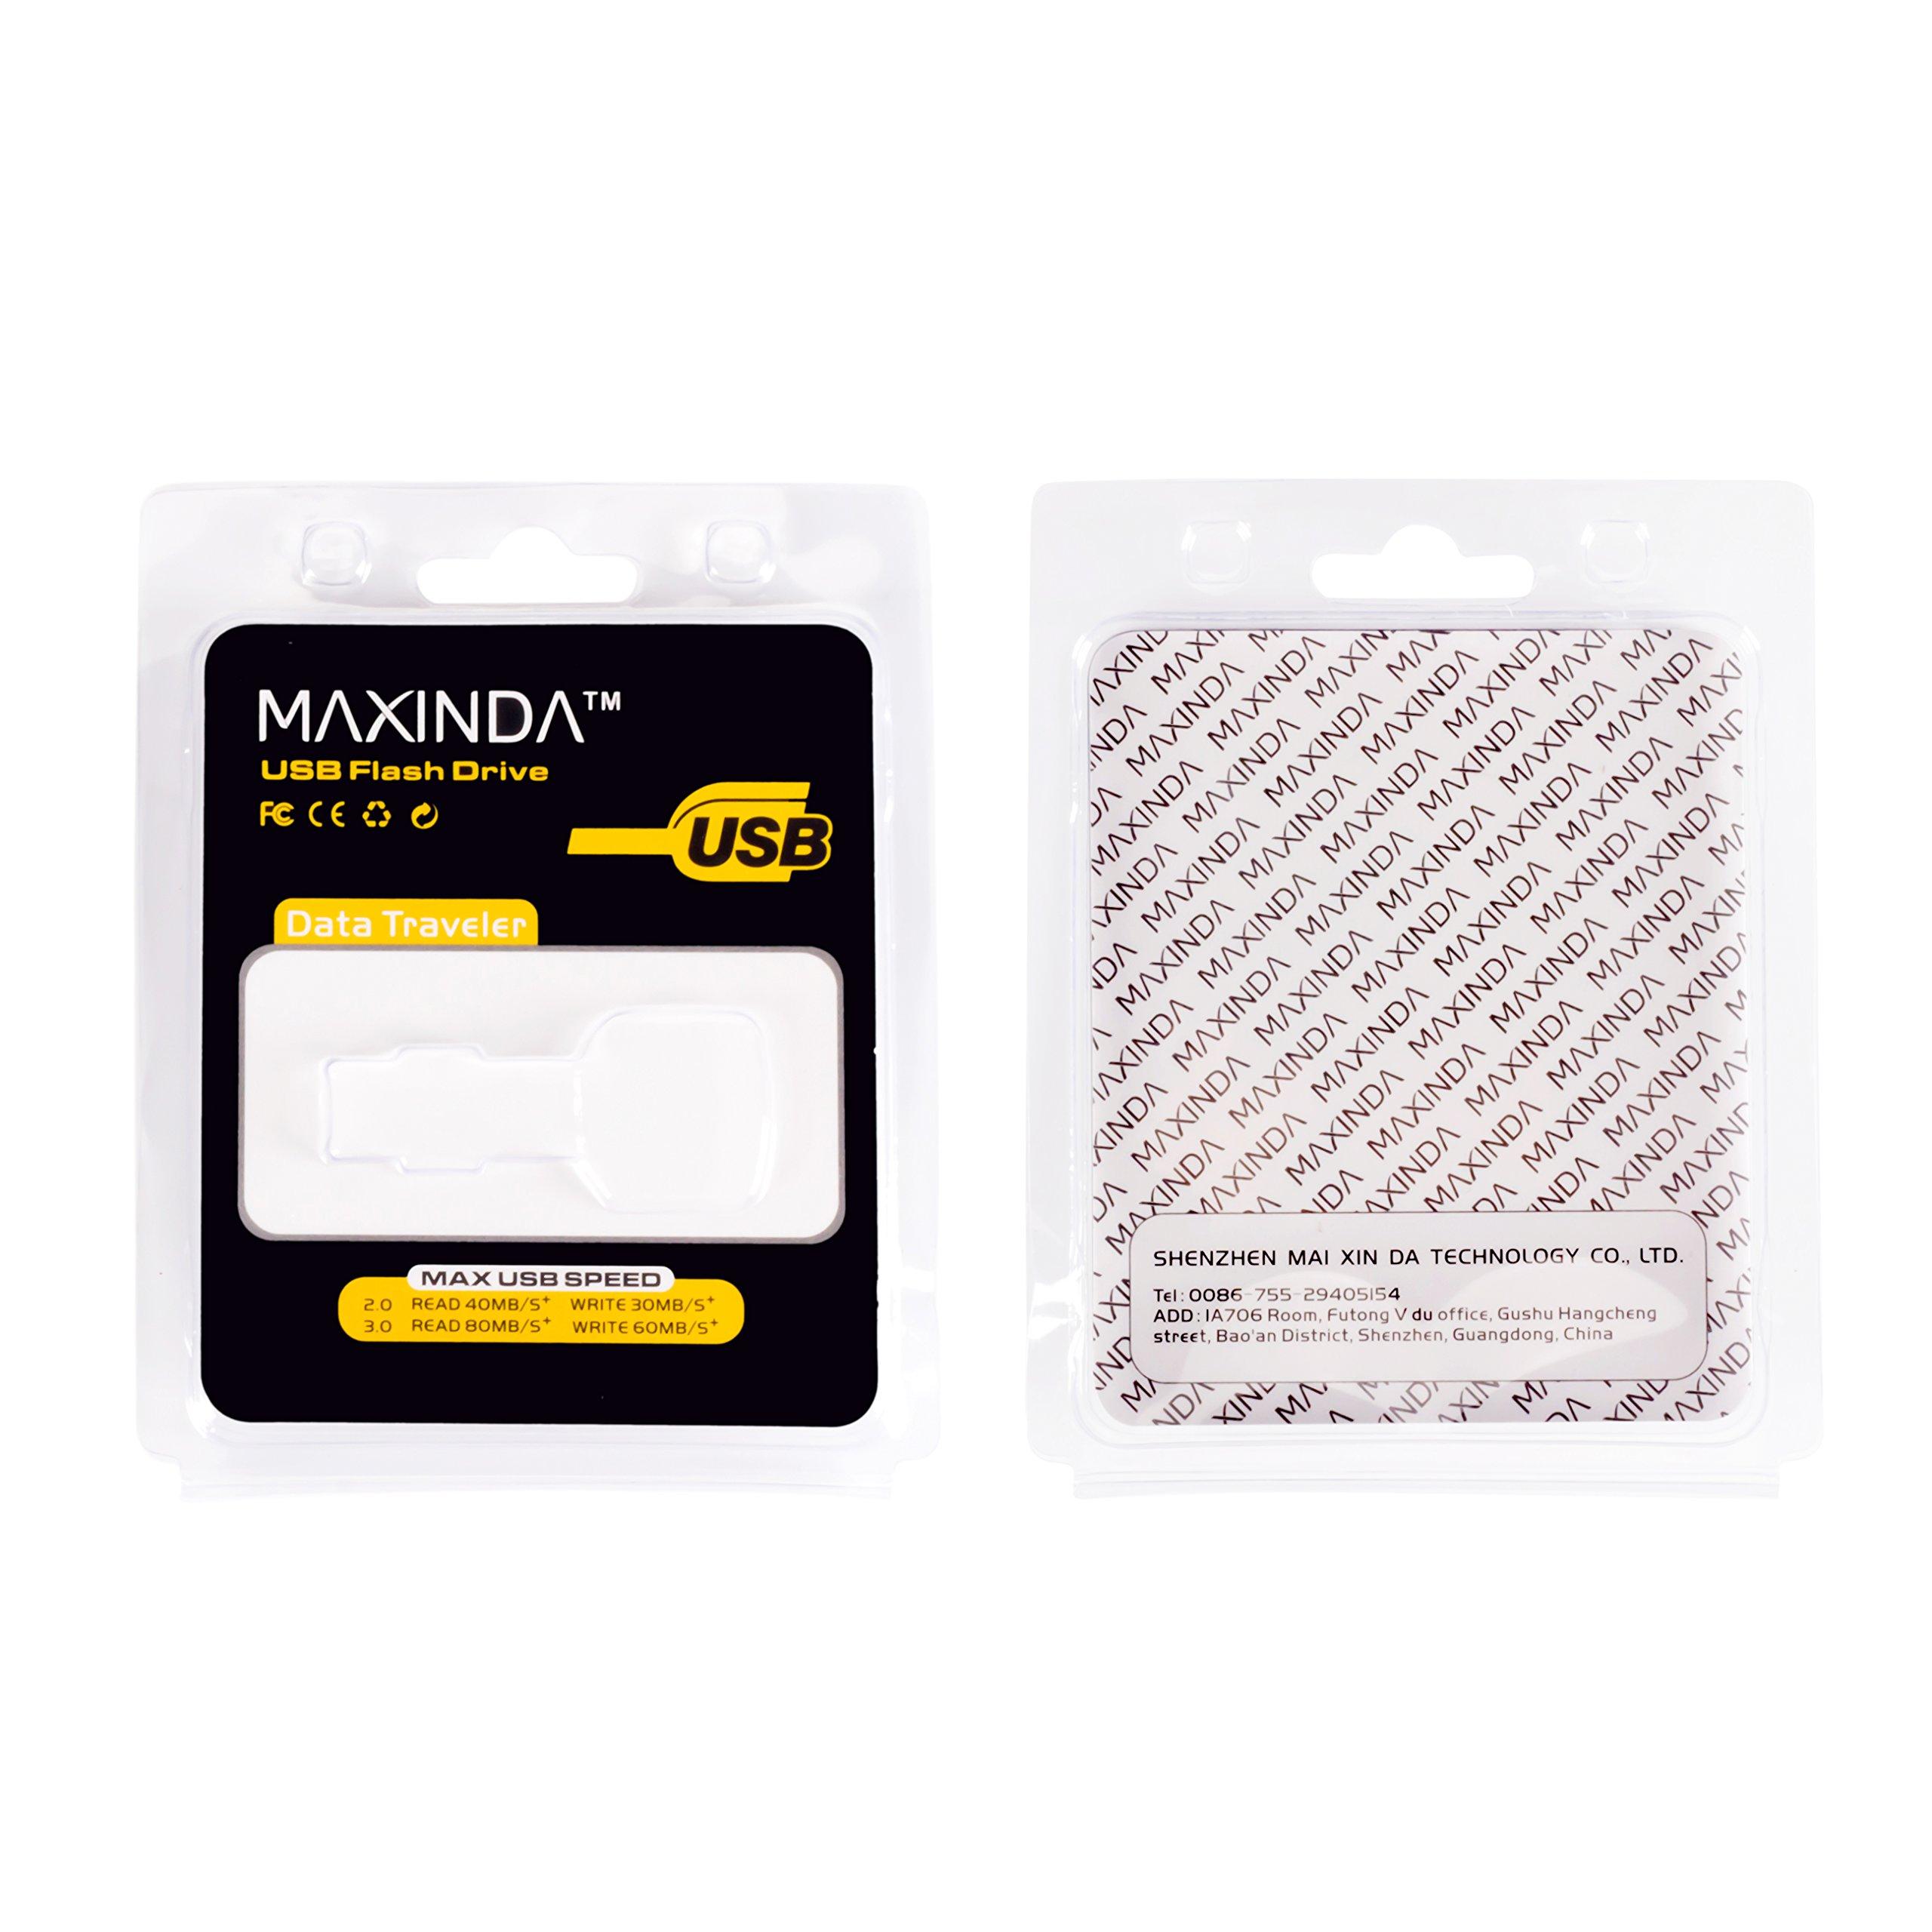 MAXINDA 8GB / 16GB / 32GB / 64GB Chiavetta USB Flash Drive in Metallo forma Chiave 2.0 USB Flash Drive (Nero-32GB)